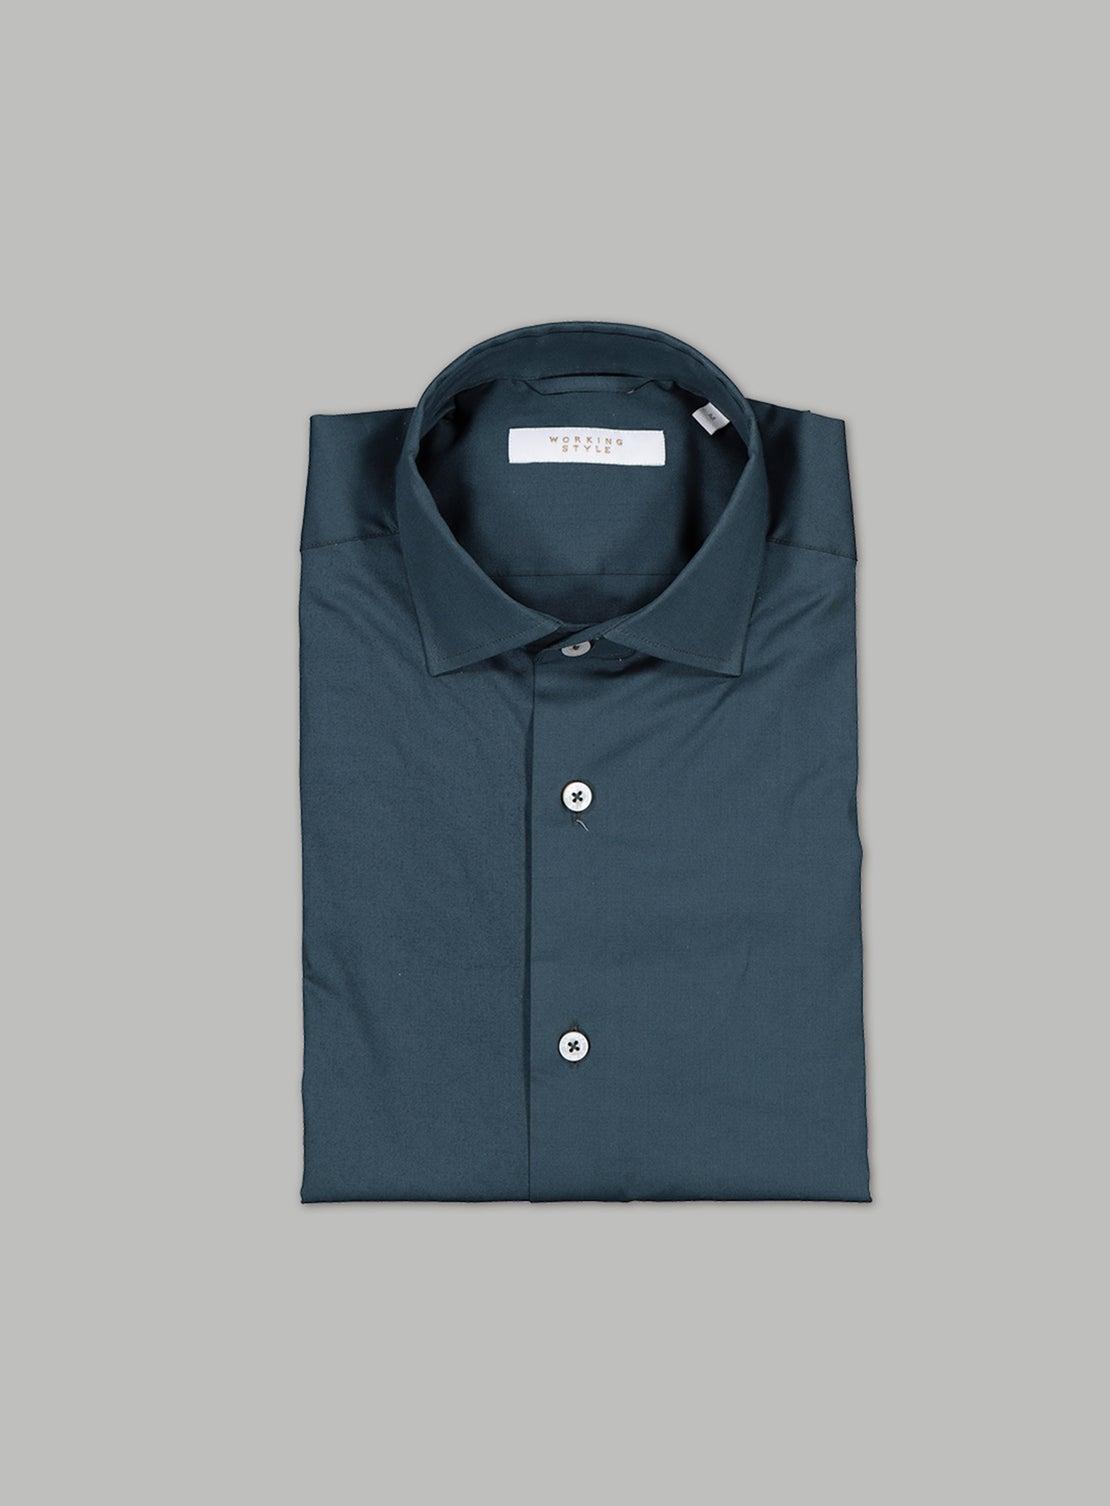 Green Stretch Poplin Shirt